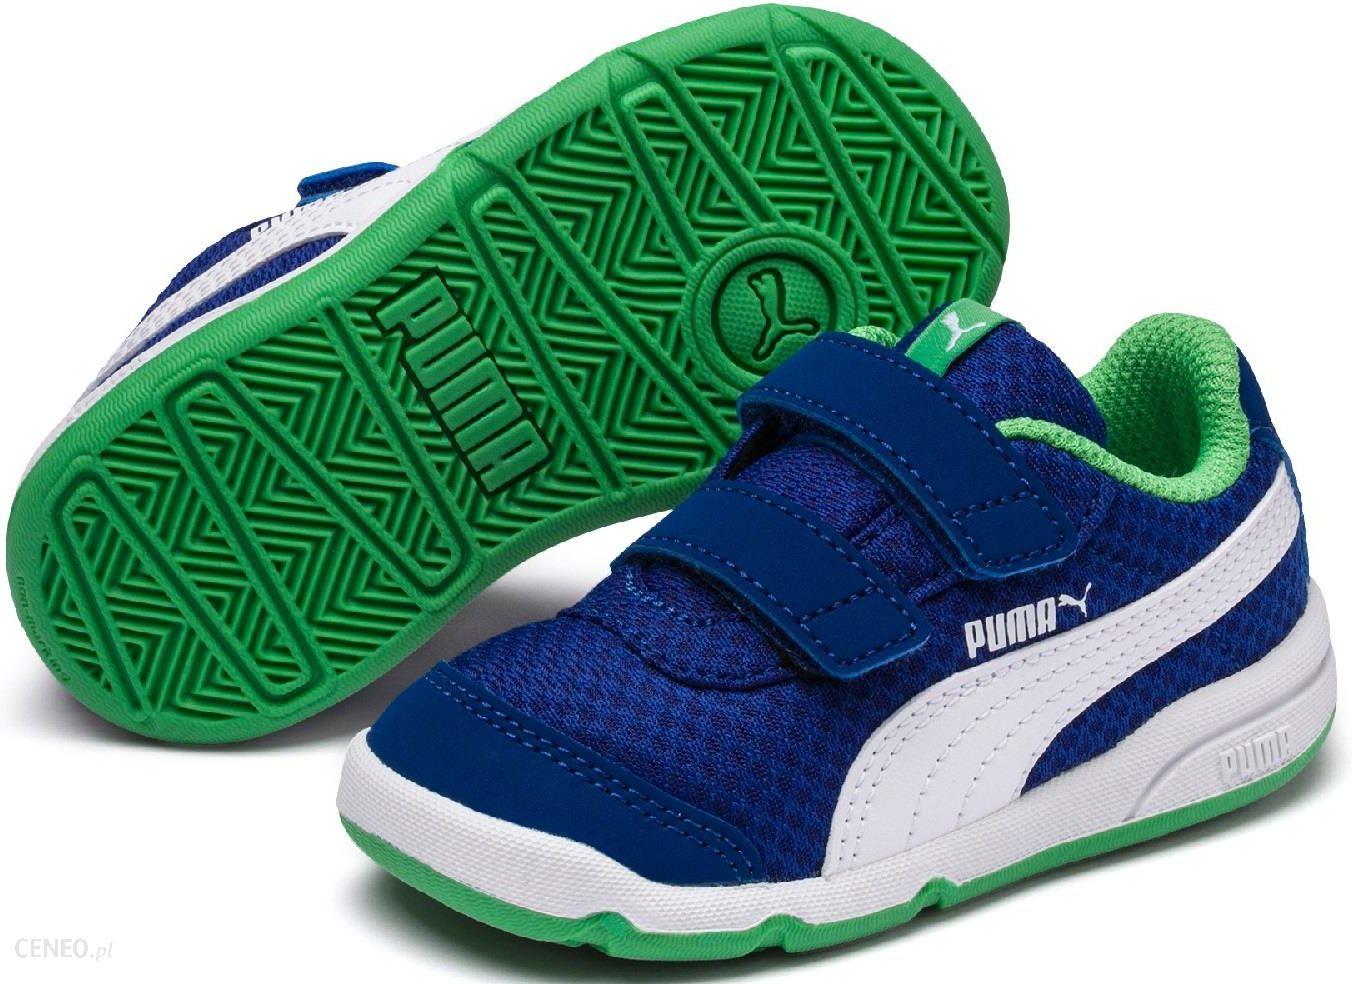 Puma Stepfleex 2 Mesh V PS Surf The Web Irish Green White 34 35 Ceny i opinie Ceneo.pl